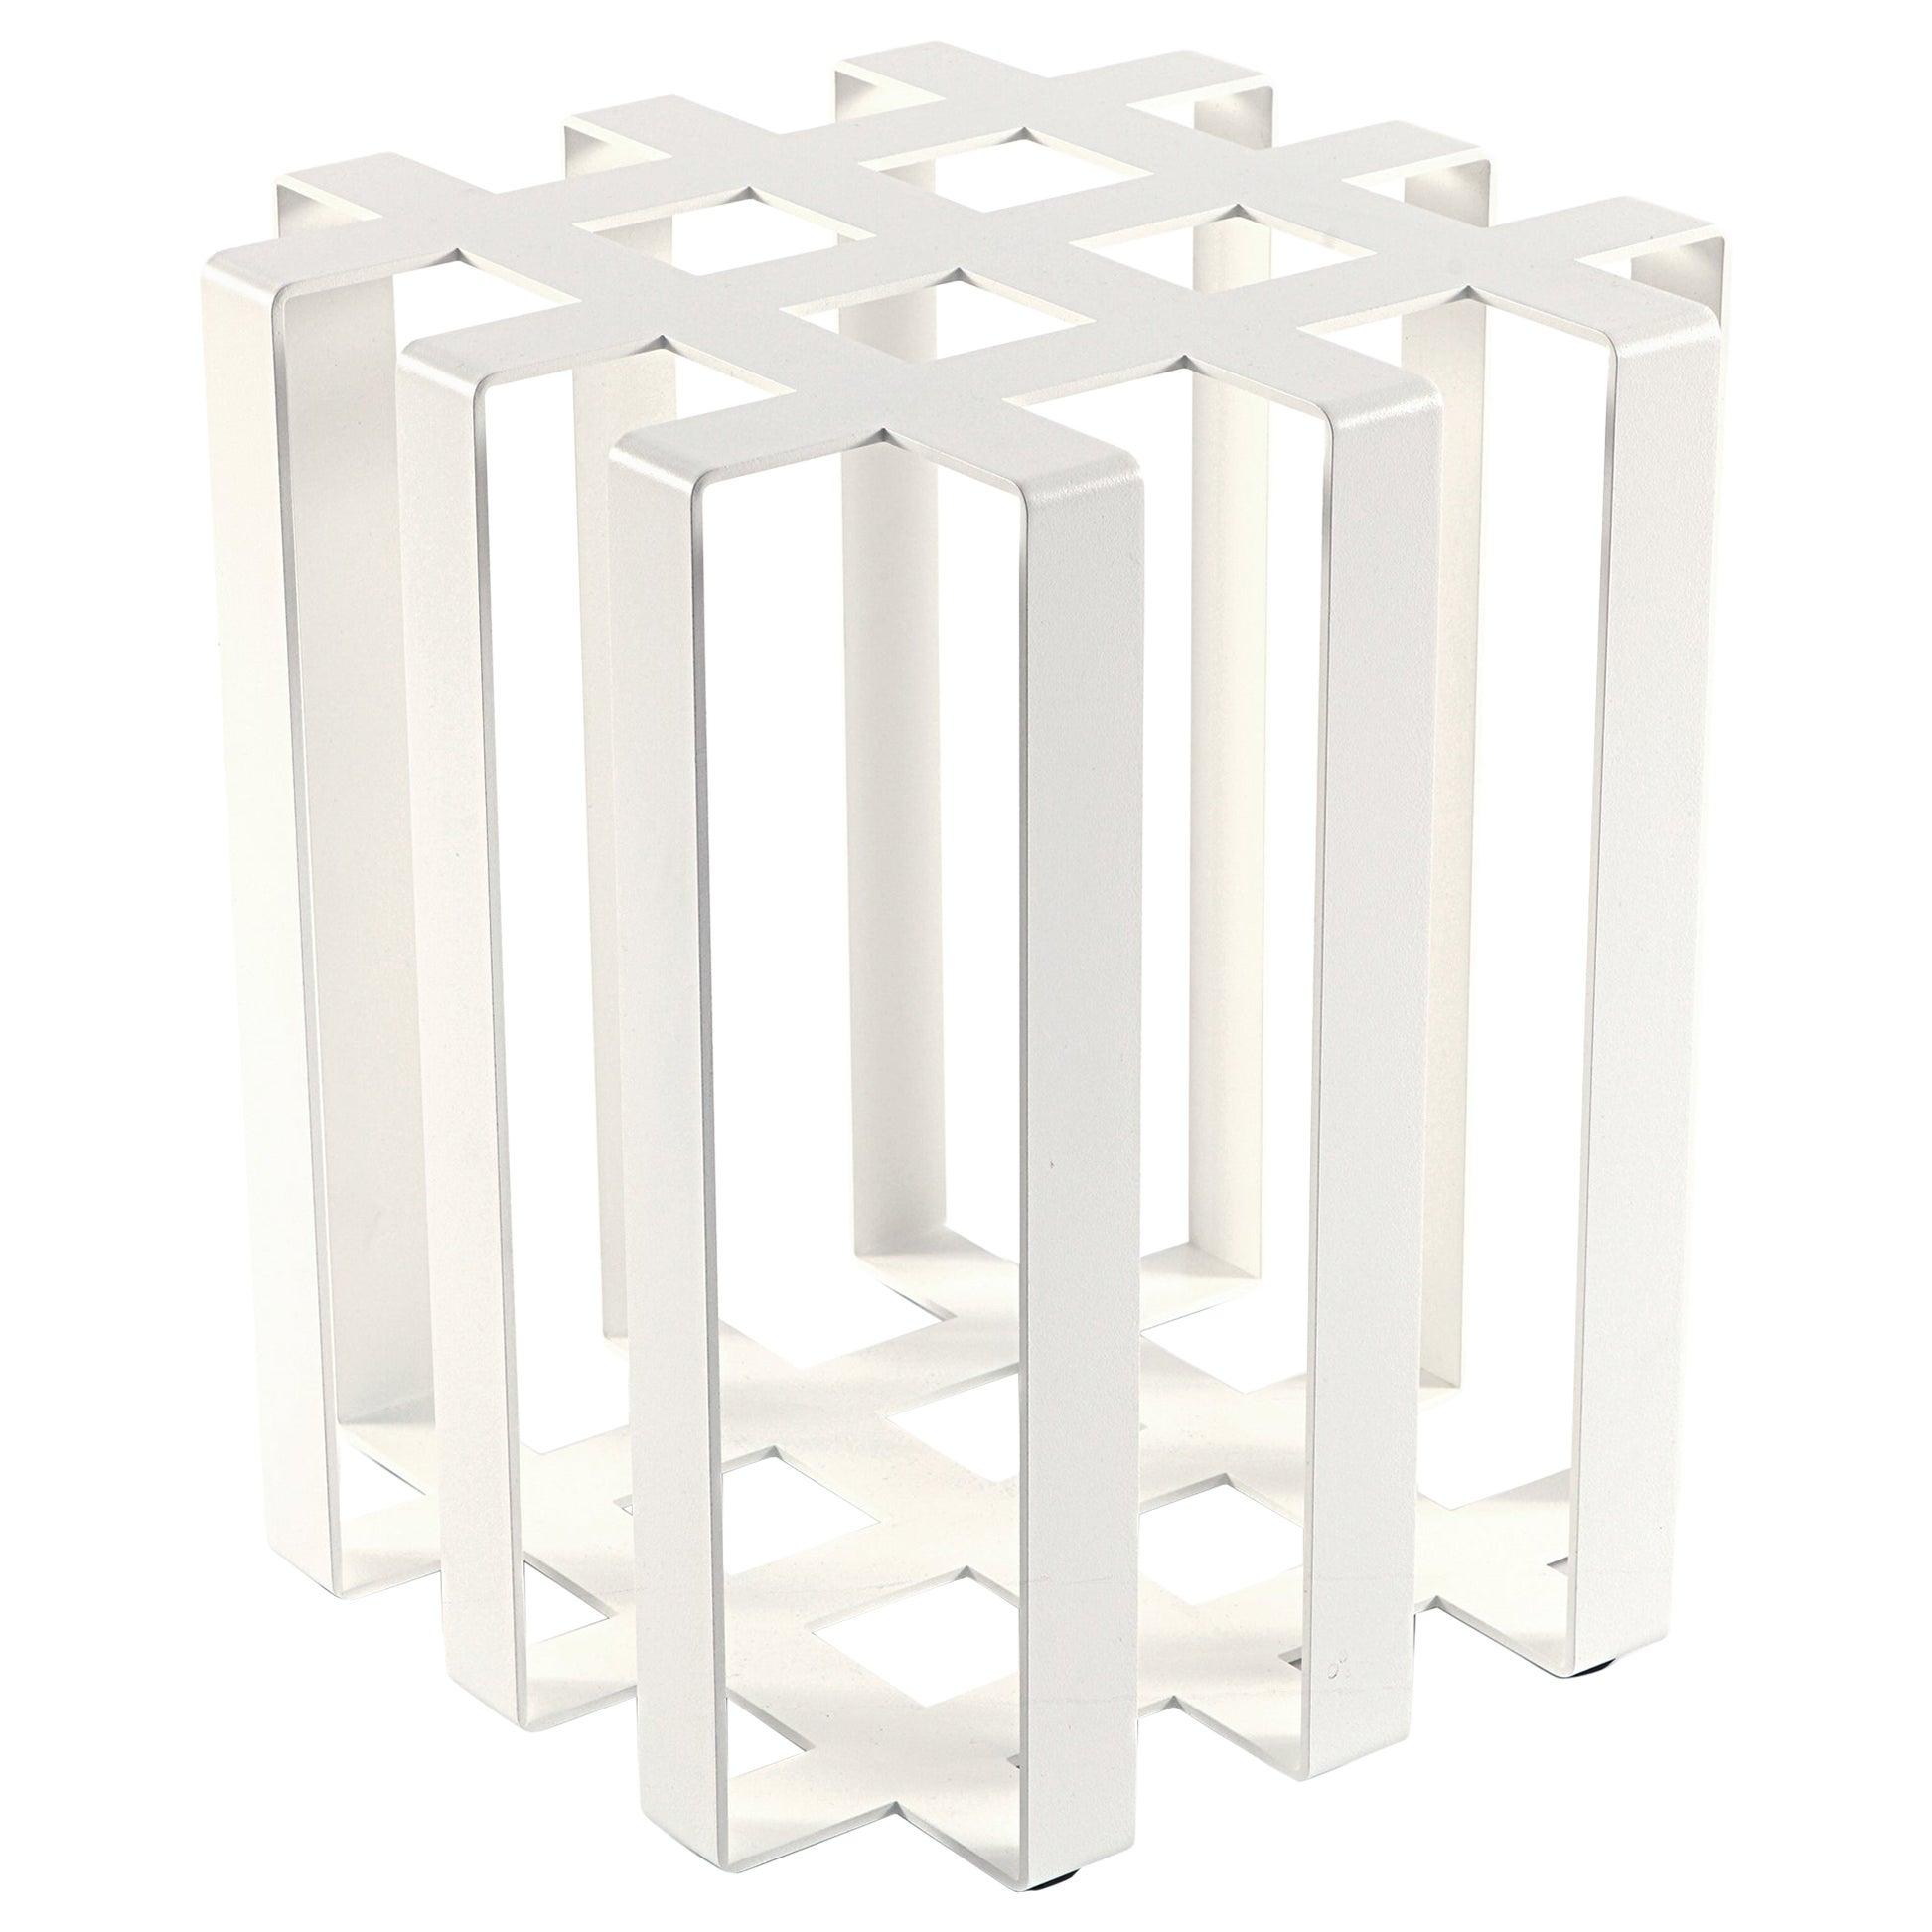 Ramen Geometric Modern Sculptural Side Table White Powder-Coated Steel